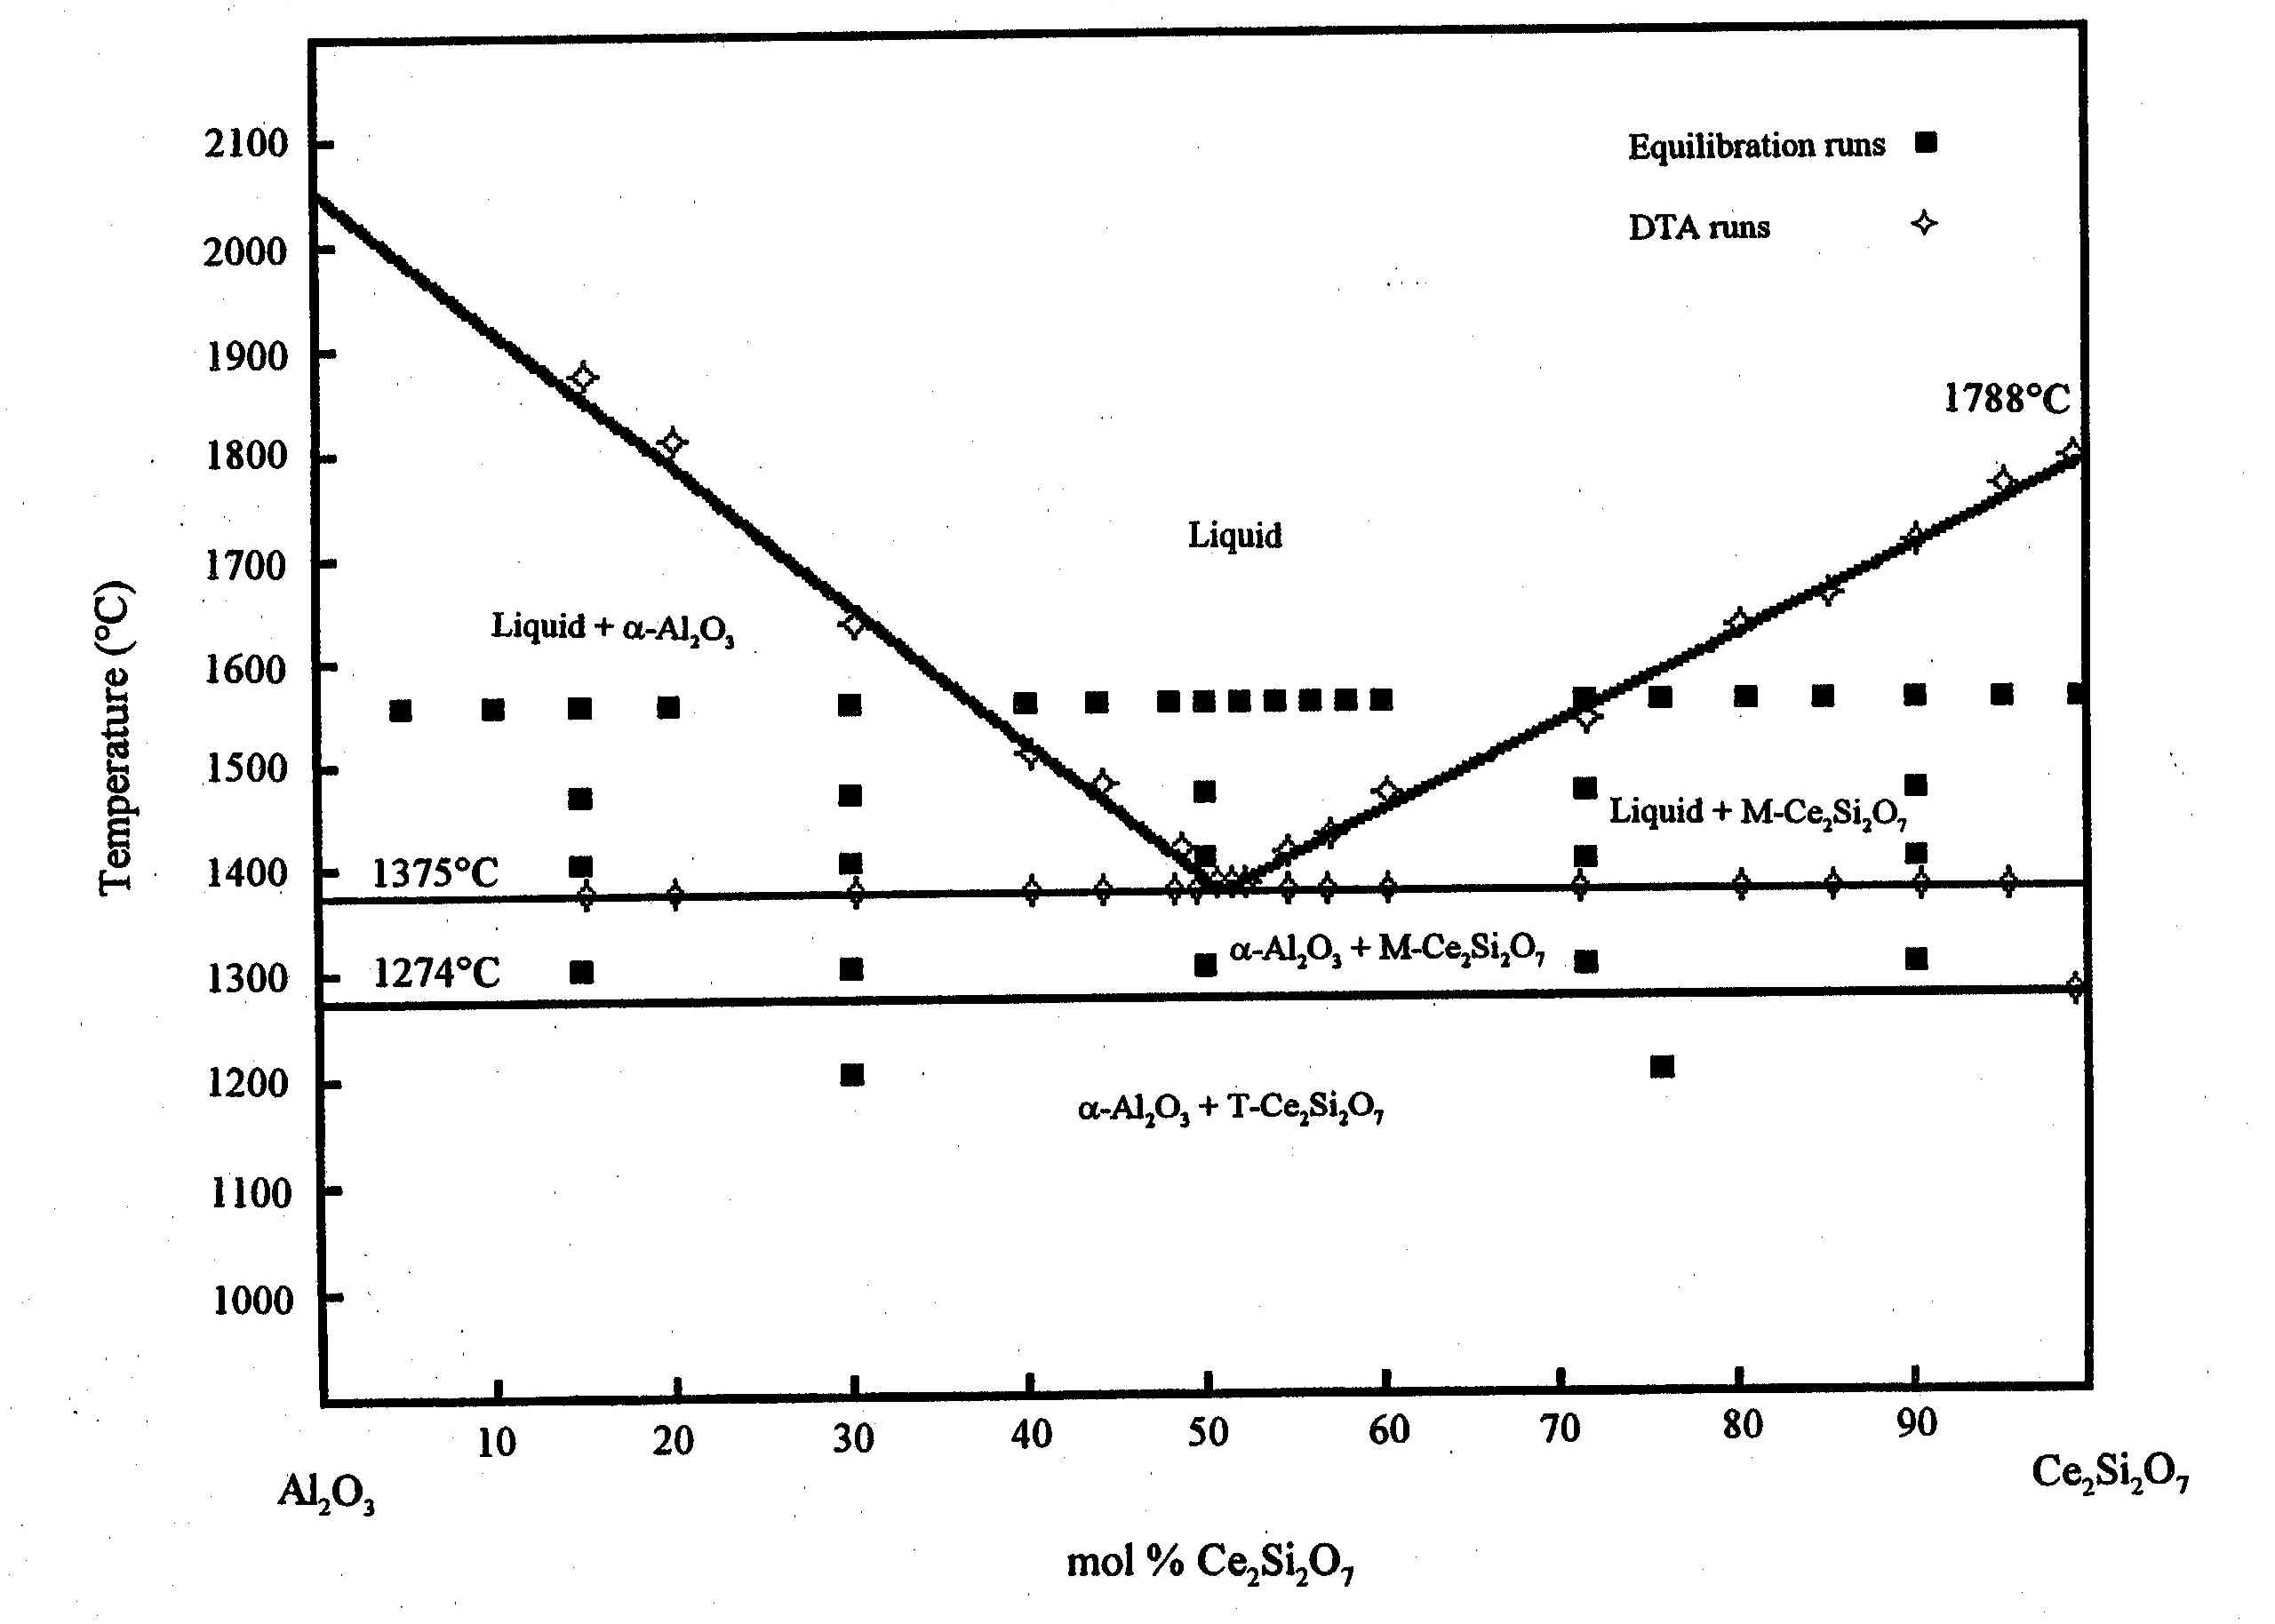 Phase diagram of the binary system: Al2O3-Ce2Si2O7